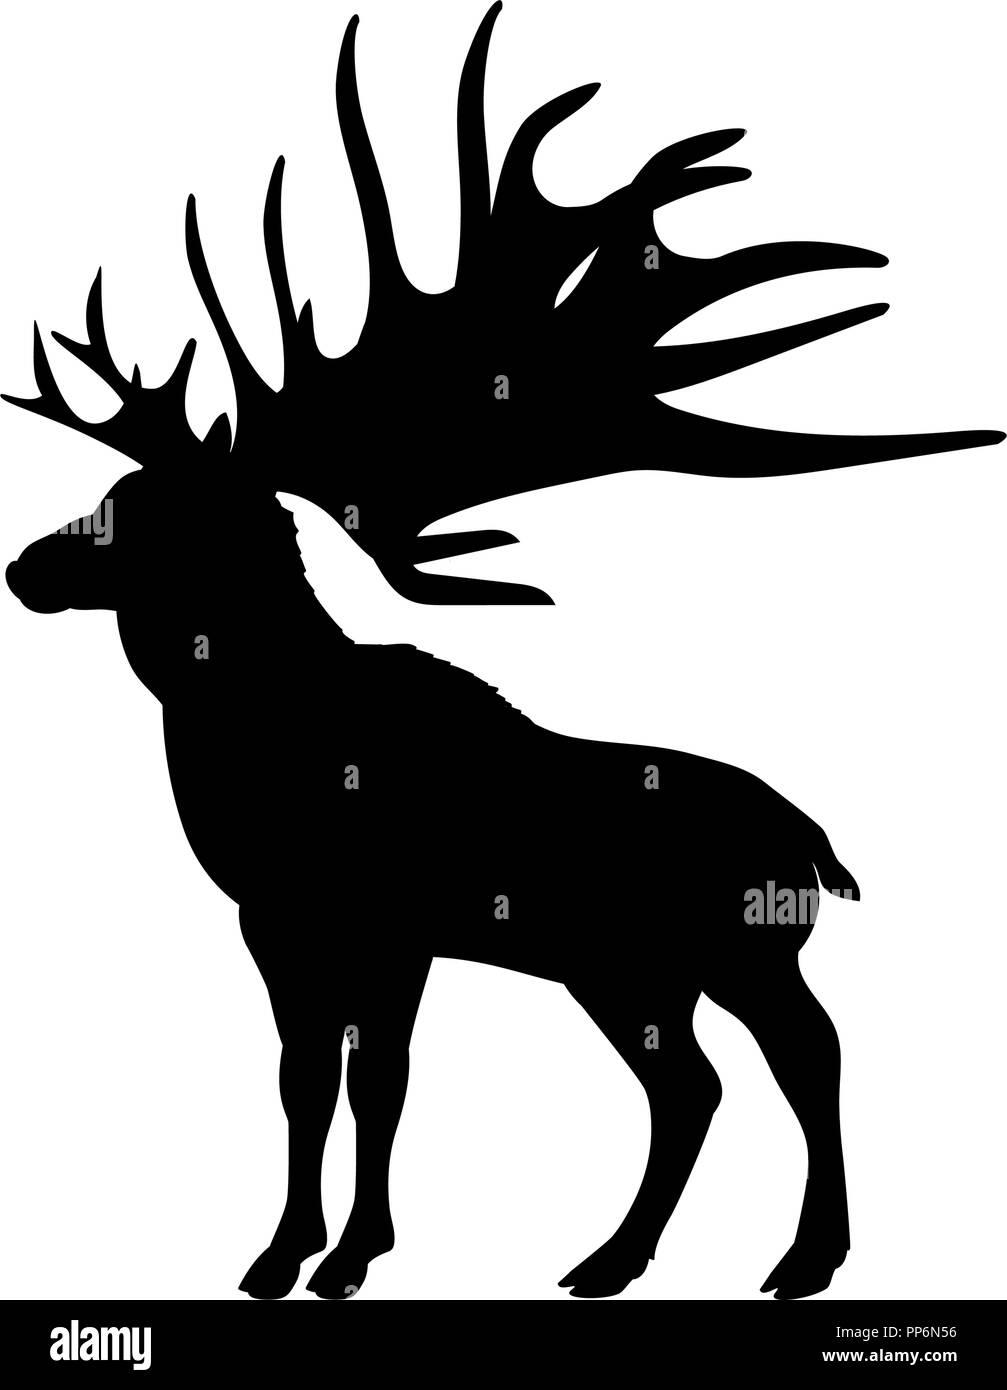 Megaloceros giant reindeer silhouette extinct mammalian animal - Stock Image